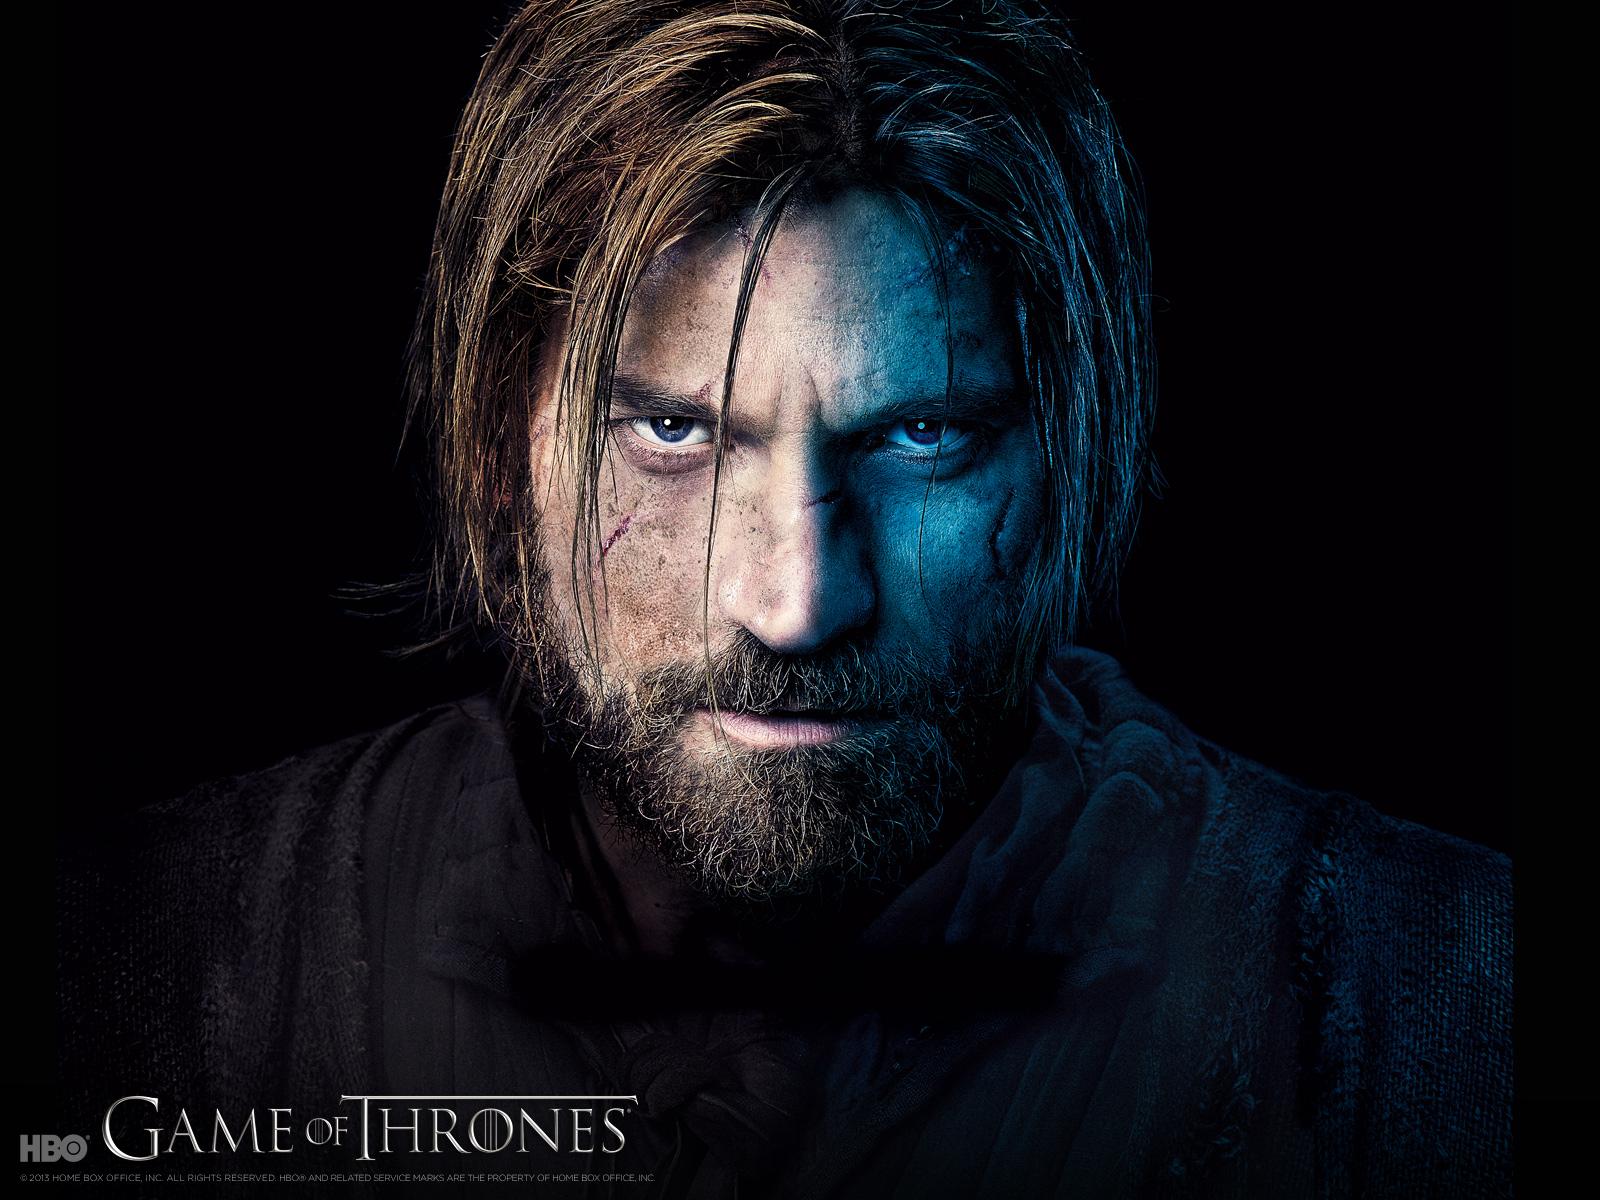 Game of Thrones Jaime Lannister Wallpaper